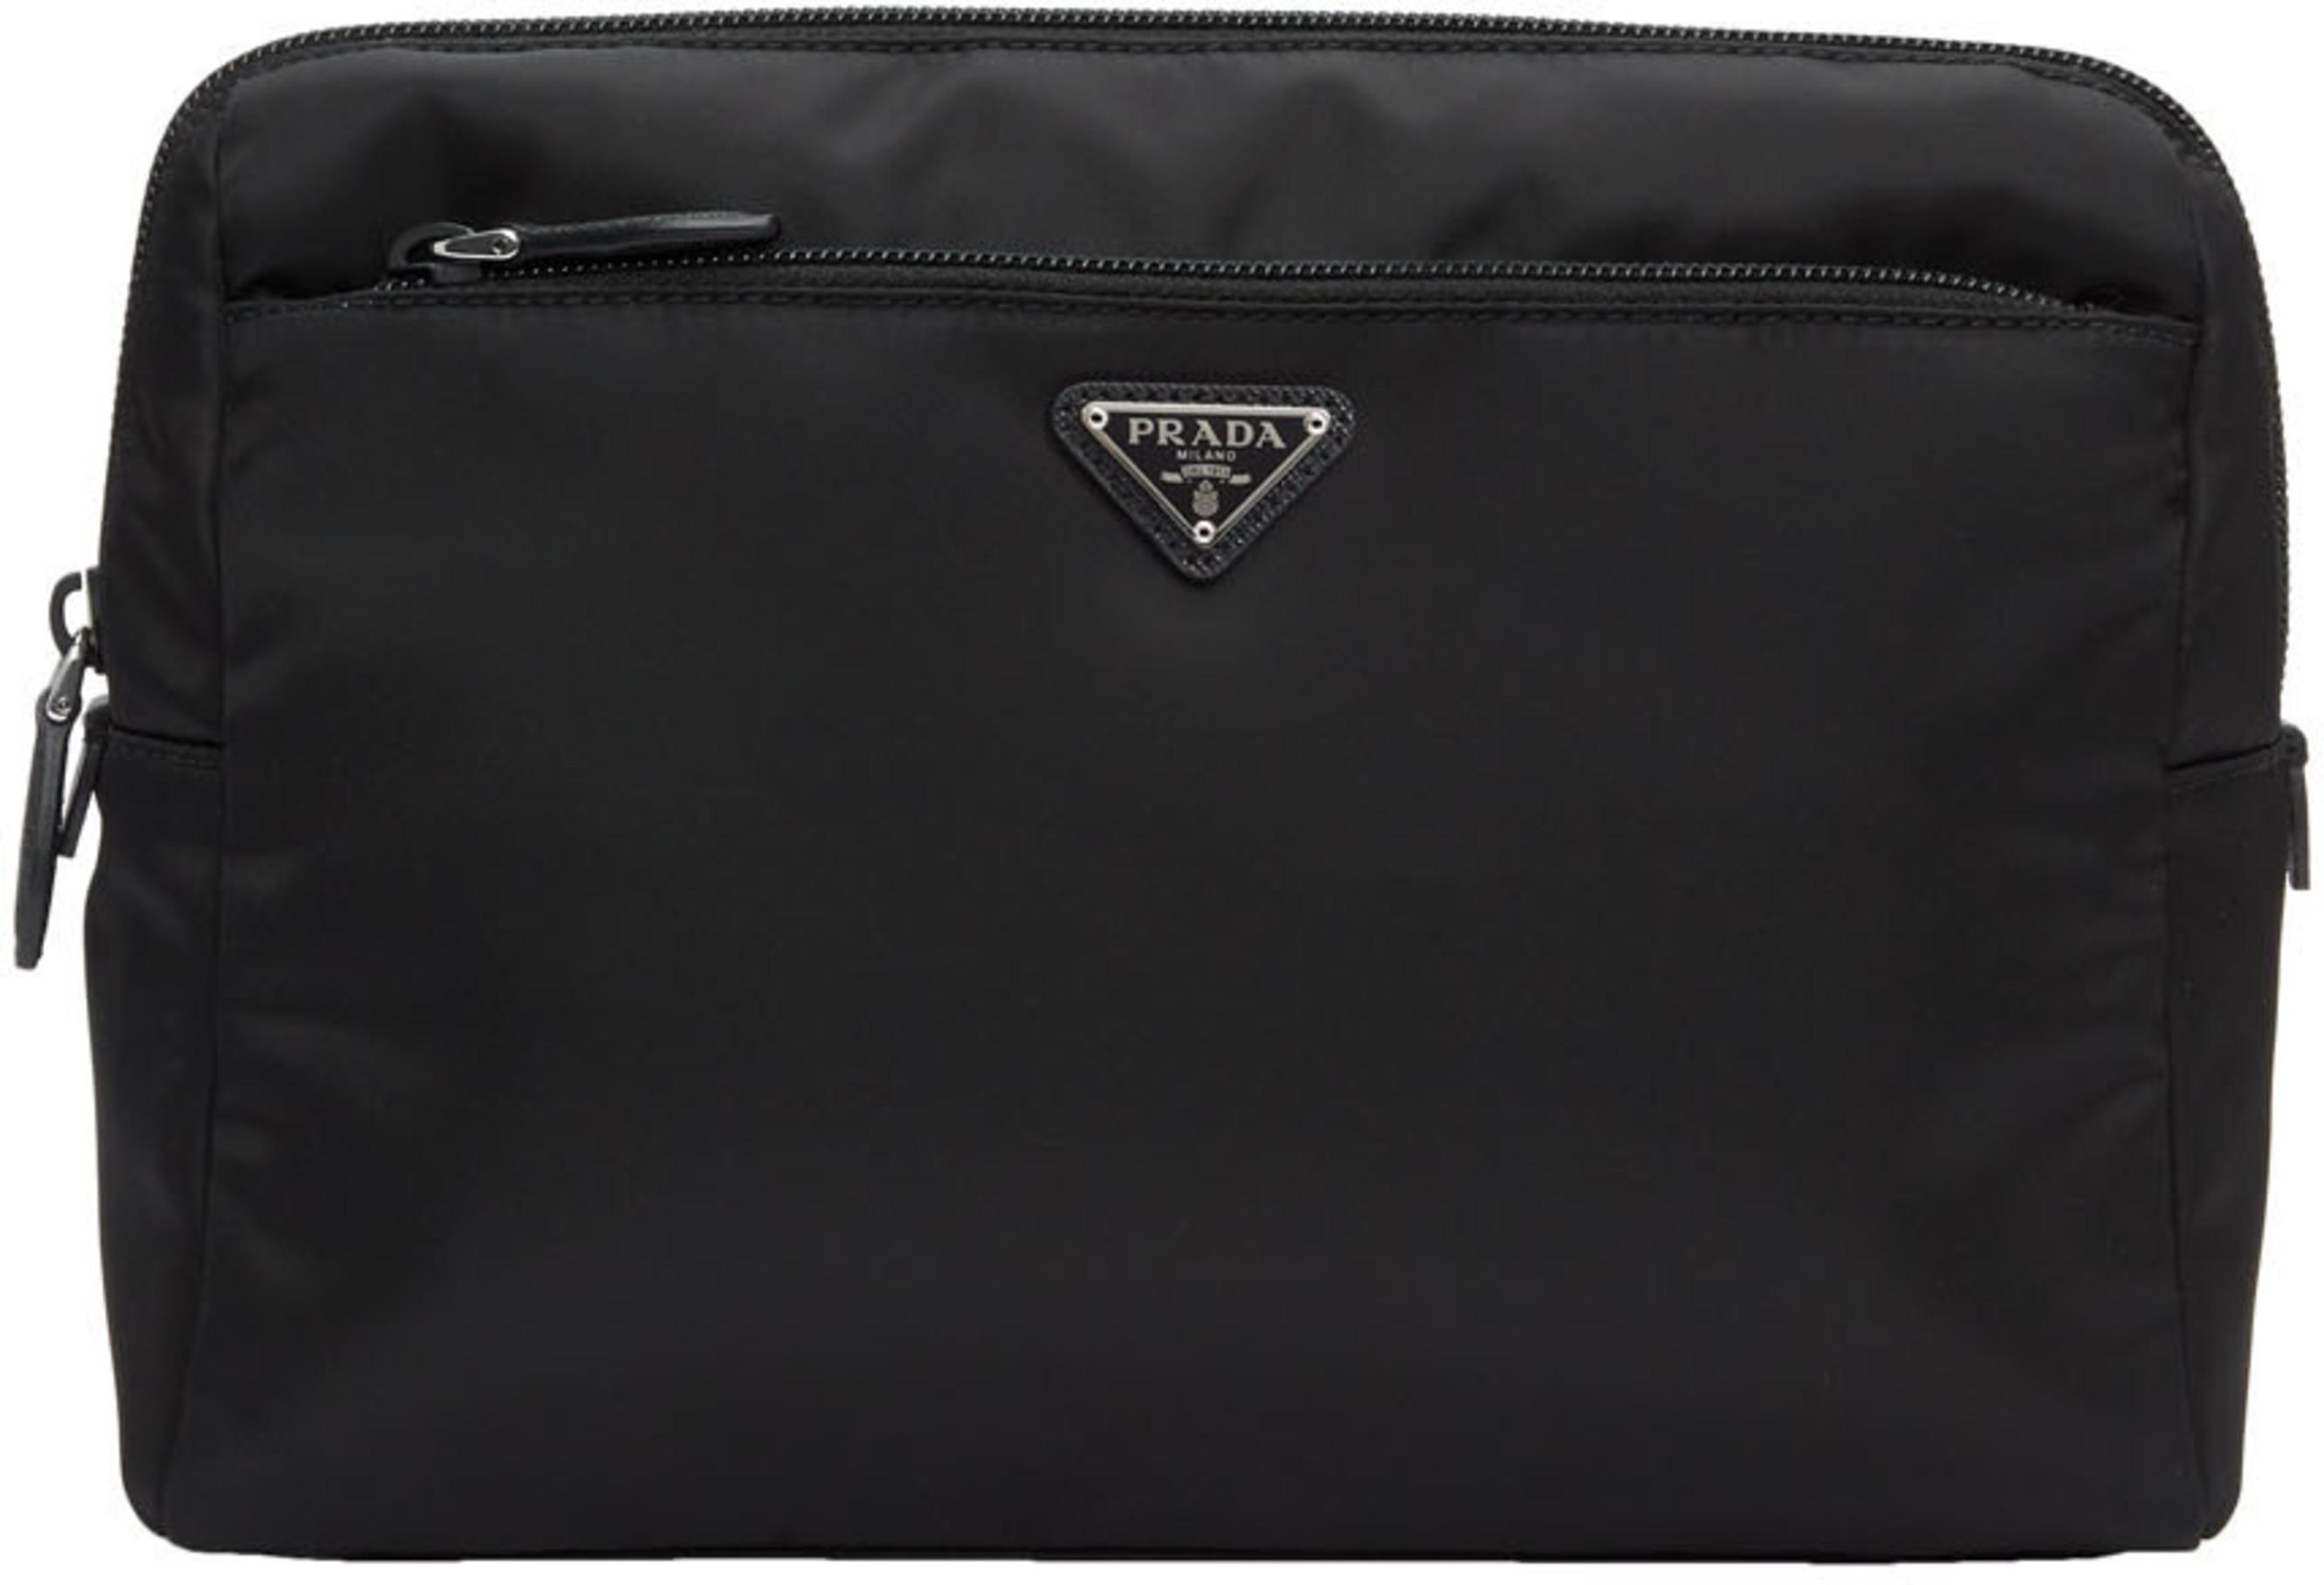 57c09ee4cb7313 Prada bags for Women | SSENSE